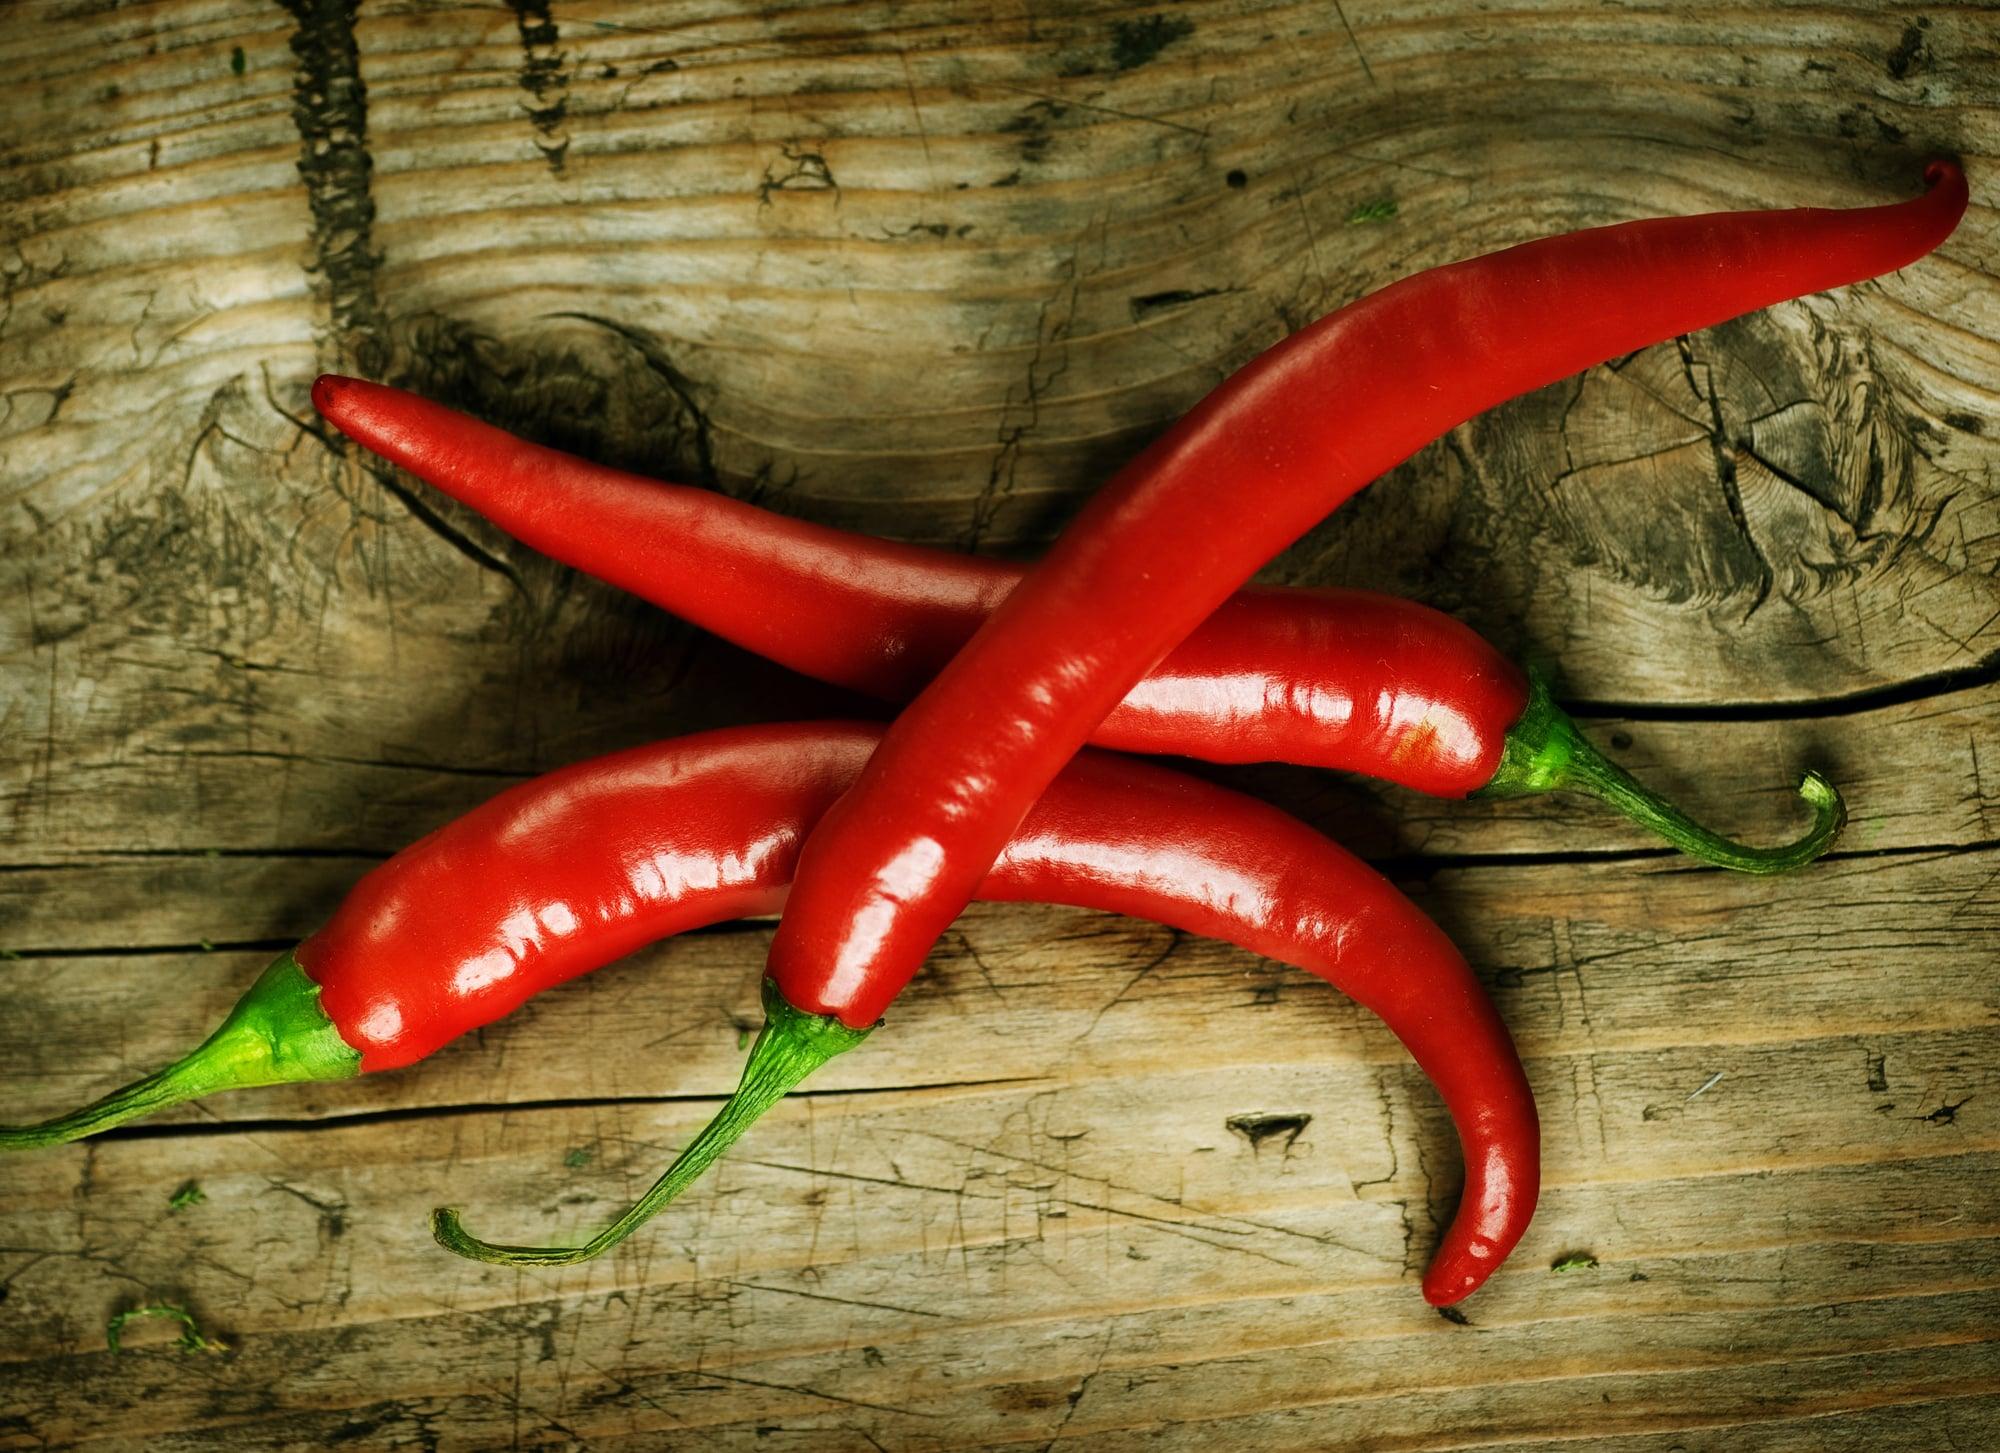 Sugar in peppers